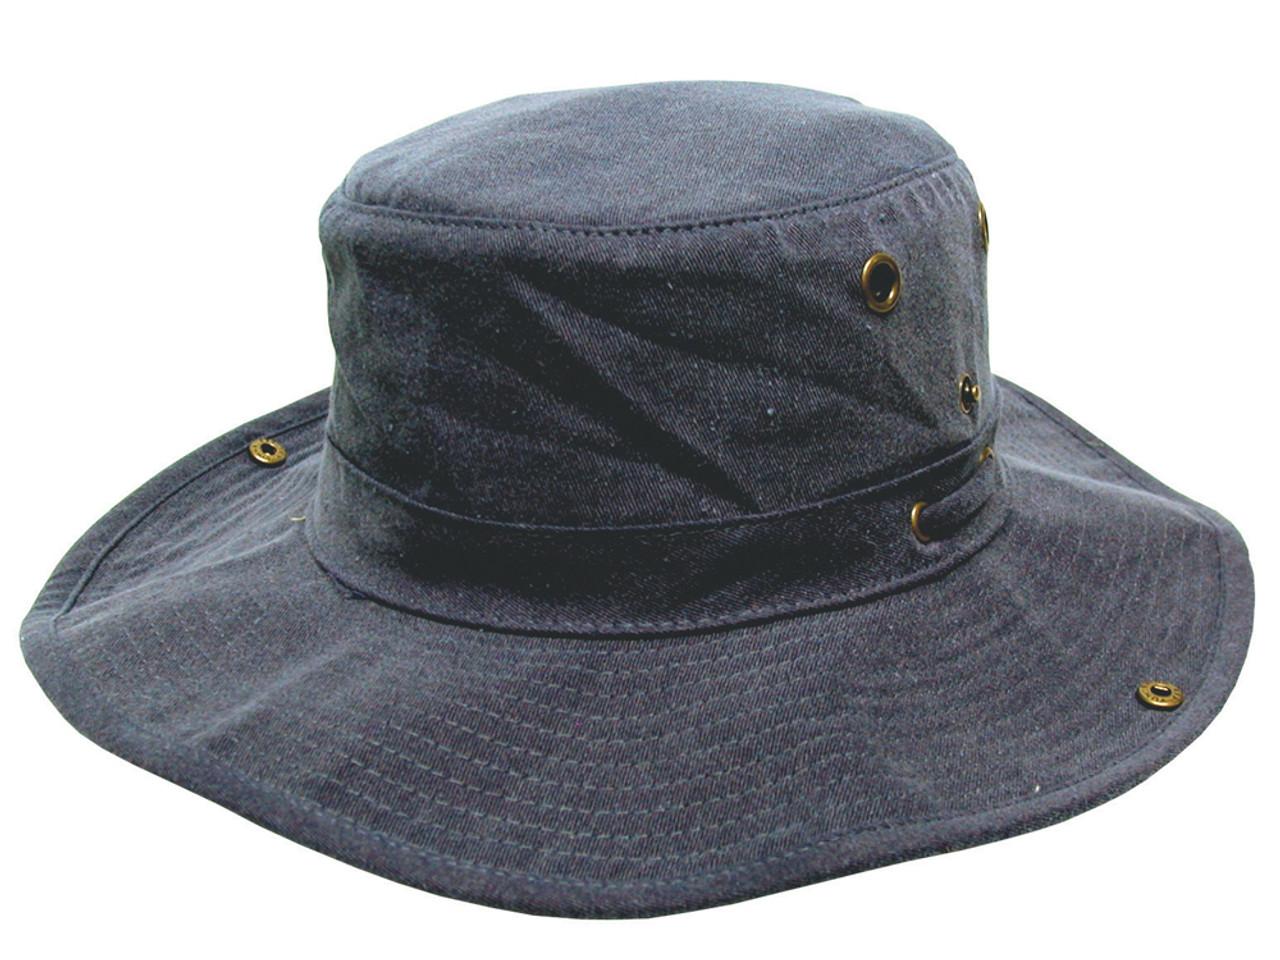 Avenel Floatation Wide Brim Hat - Navy - Mens - Cotton For Sale ... c5c7ef77f45